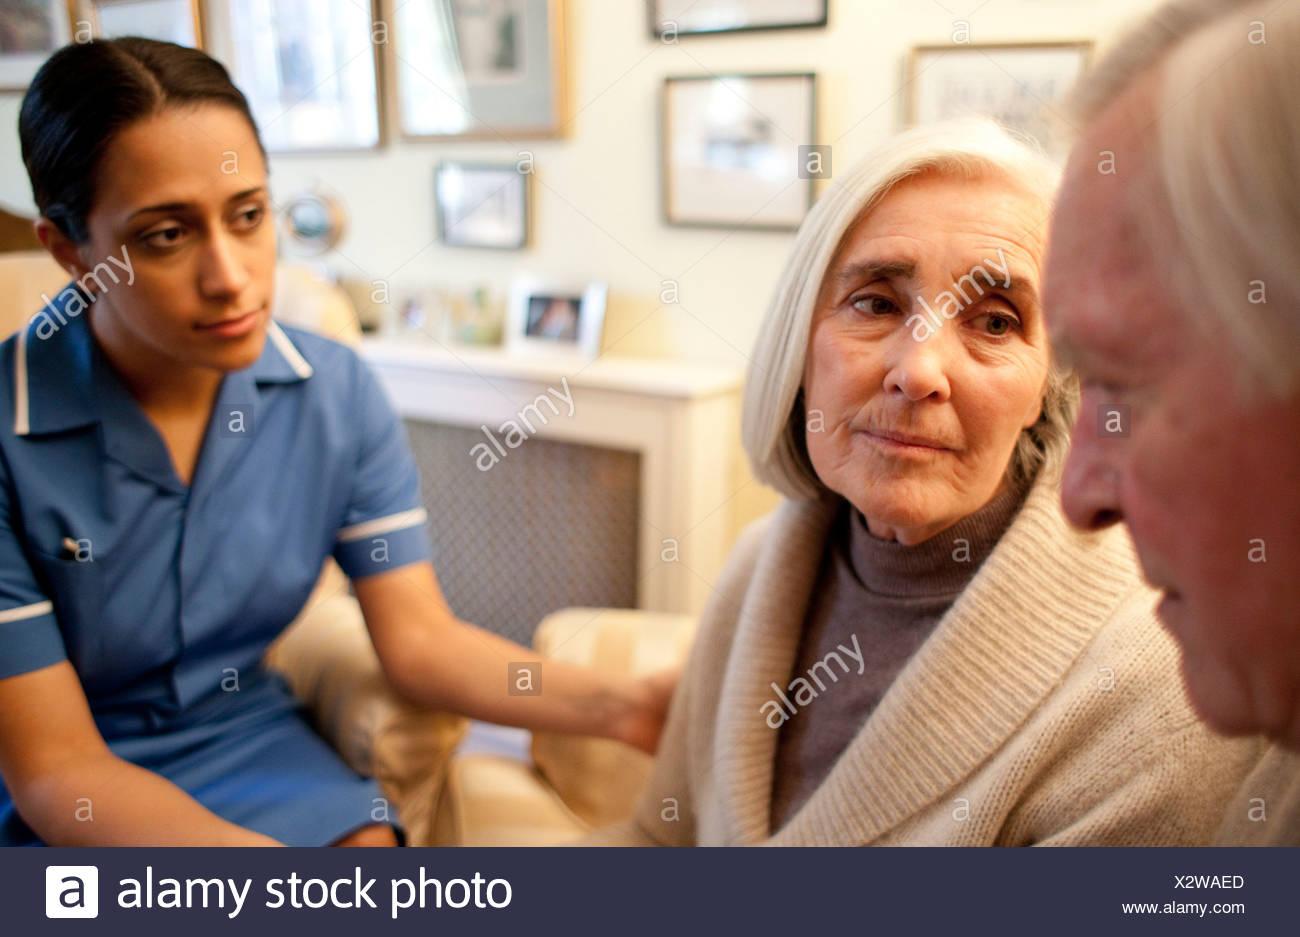 Nurse on a home visit - Stock Image